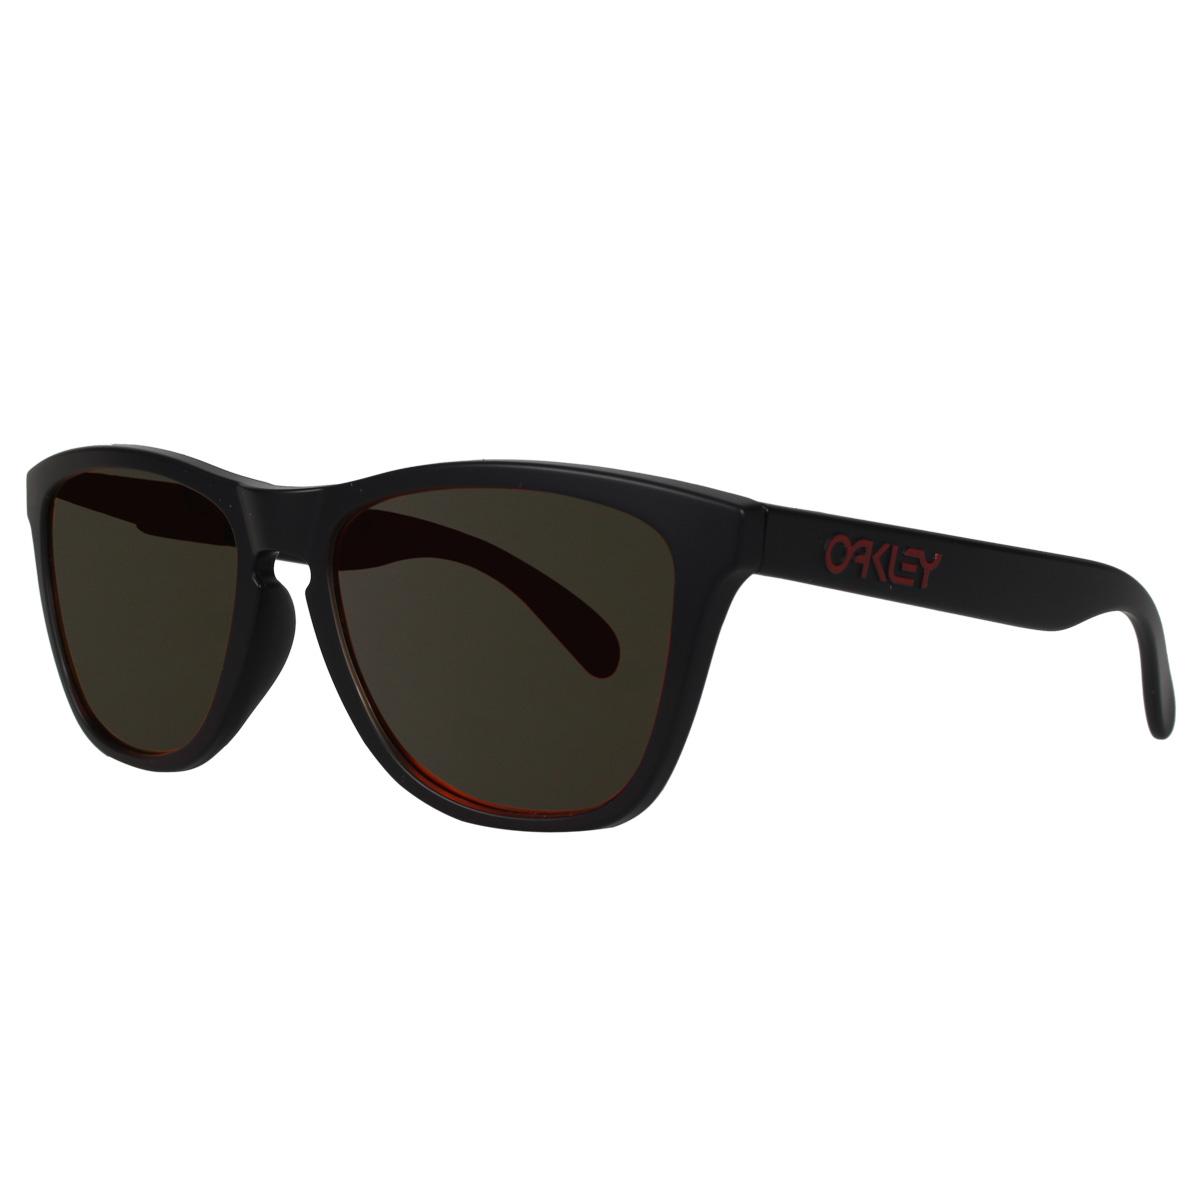 Oakley FROGSKINS ASIA FIT オークリー サングラス フロッグスキン アジアンフィット メンズ レディース ブラック 黒 0OO9245